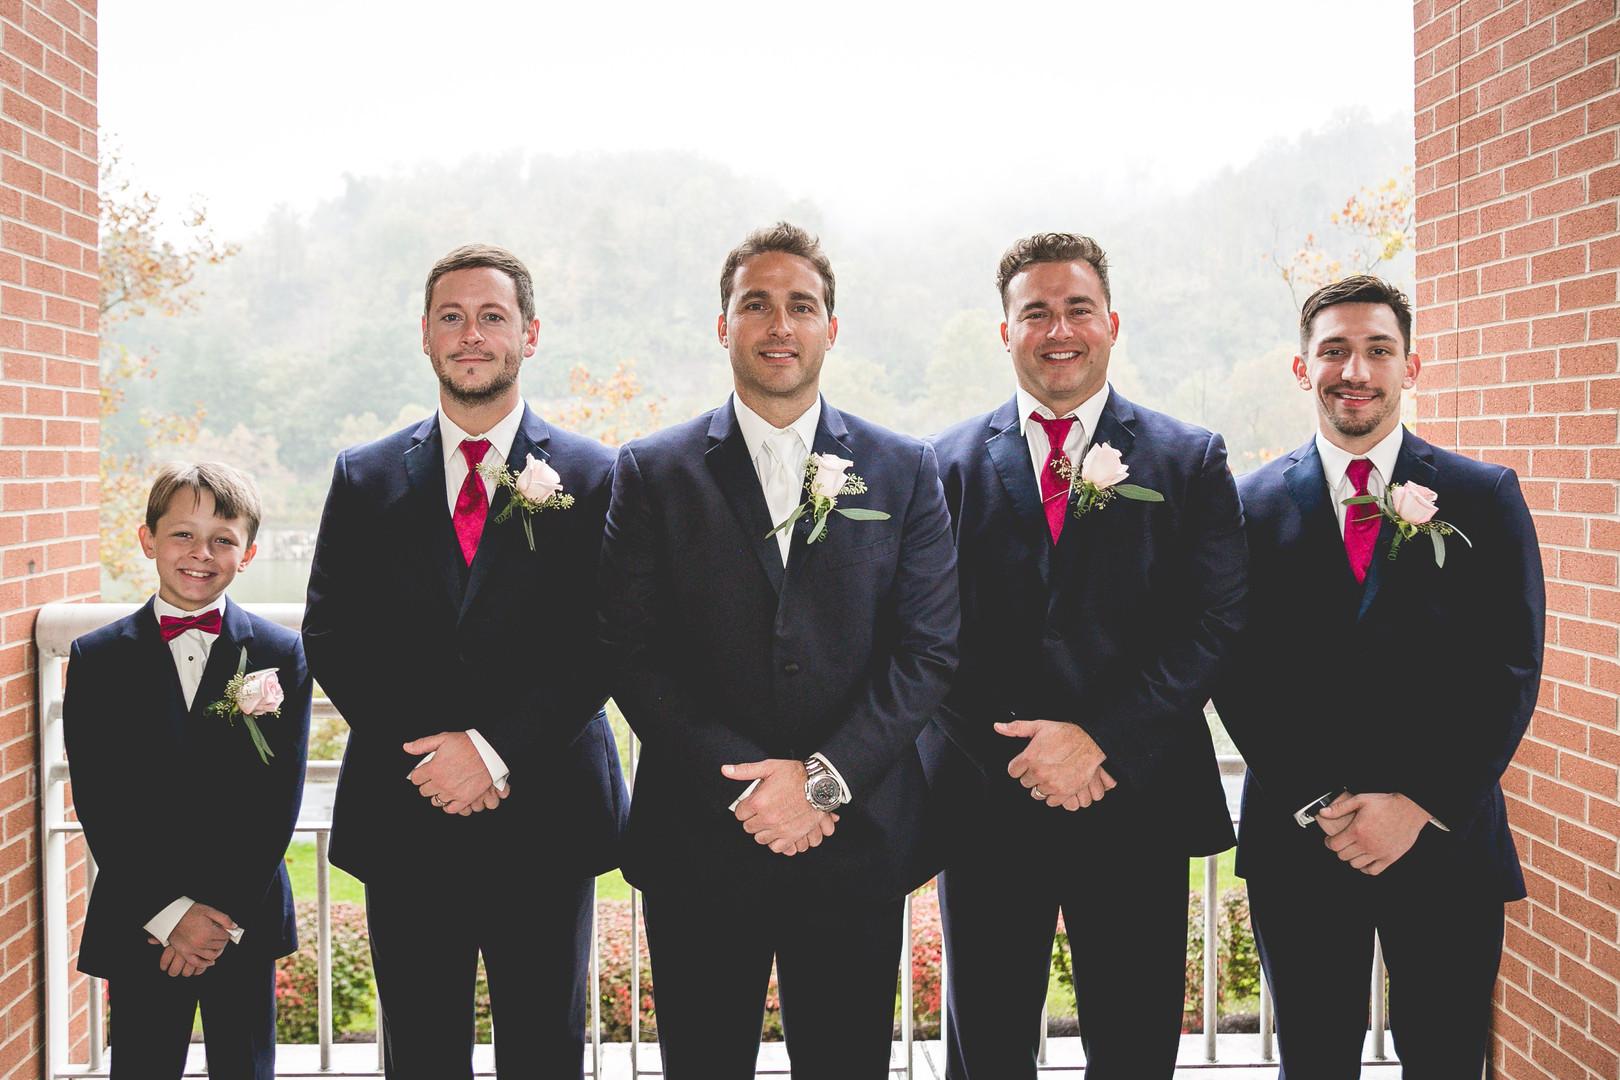 wedding-photo-bride-groom-75.jpg